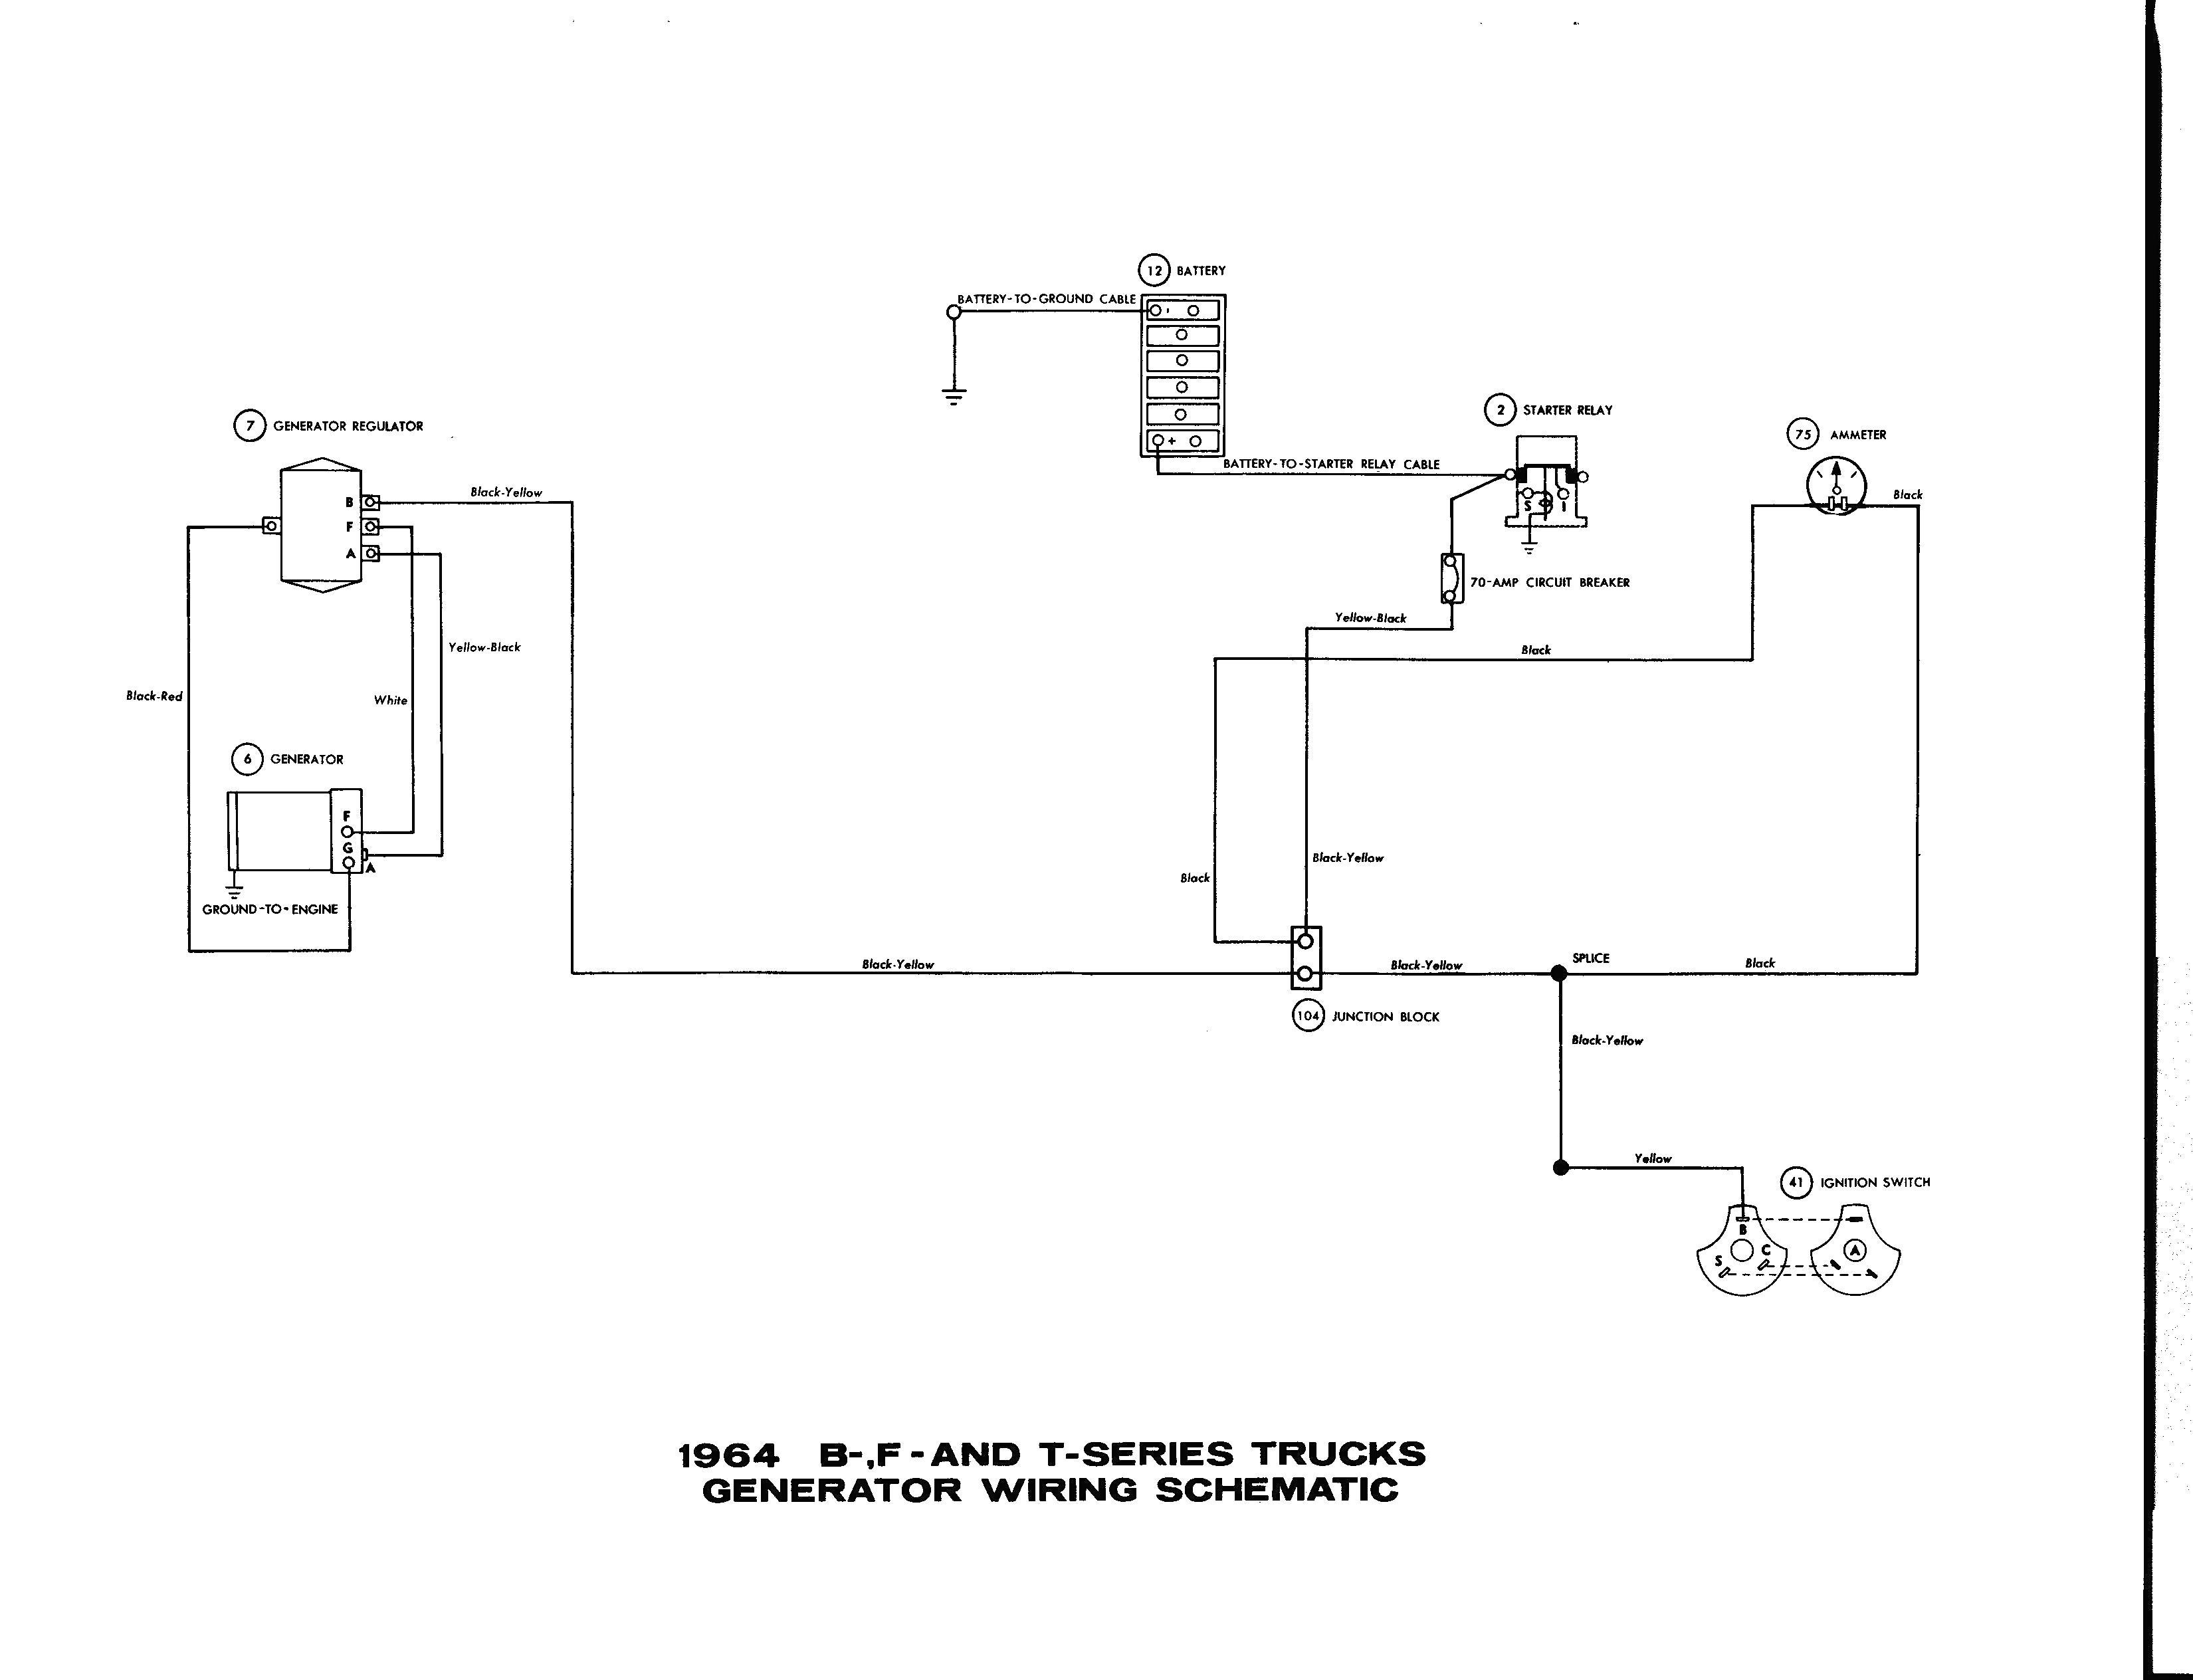 Iskra Alternator Wiring Diagram Appealing ford Transit Alternator Wiring Diagram Contemporary with Of Iskra Alternator Wiring Diagram